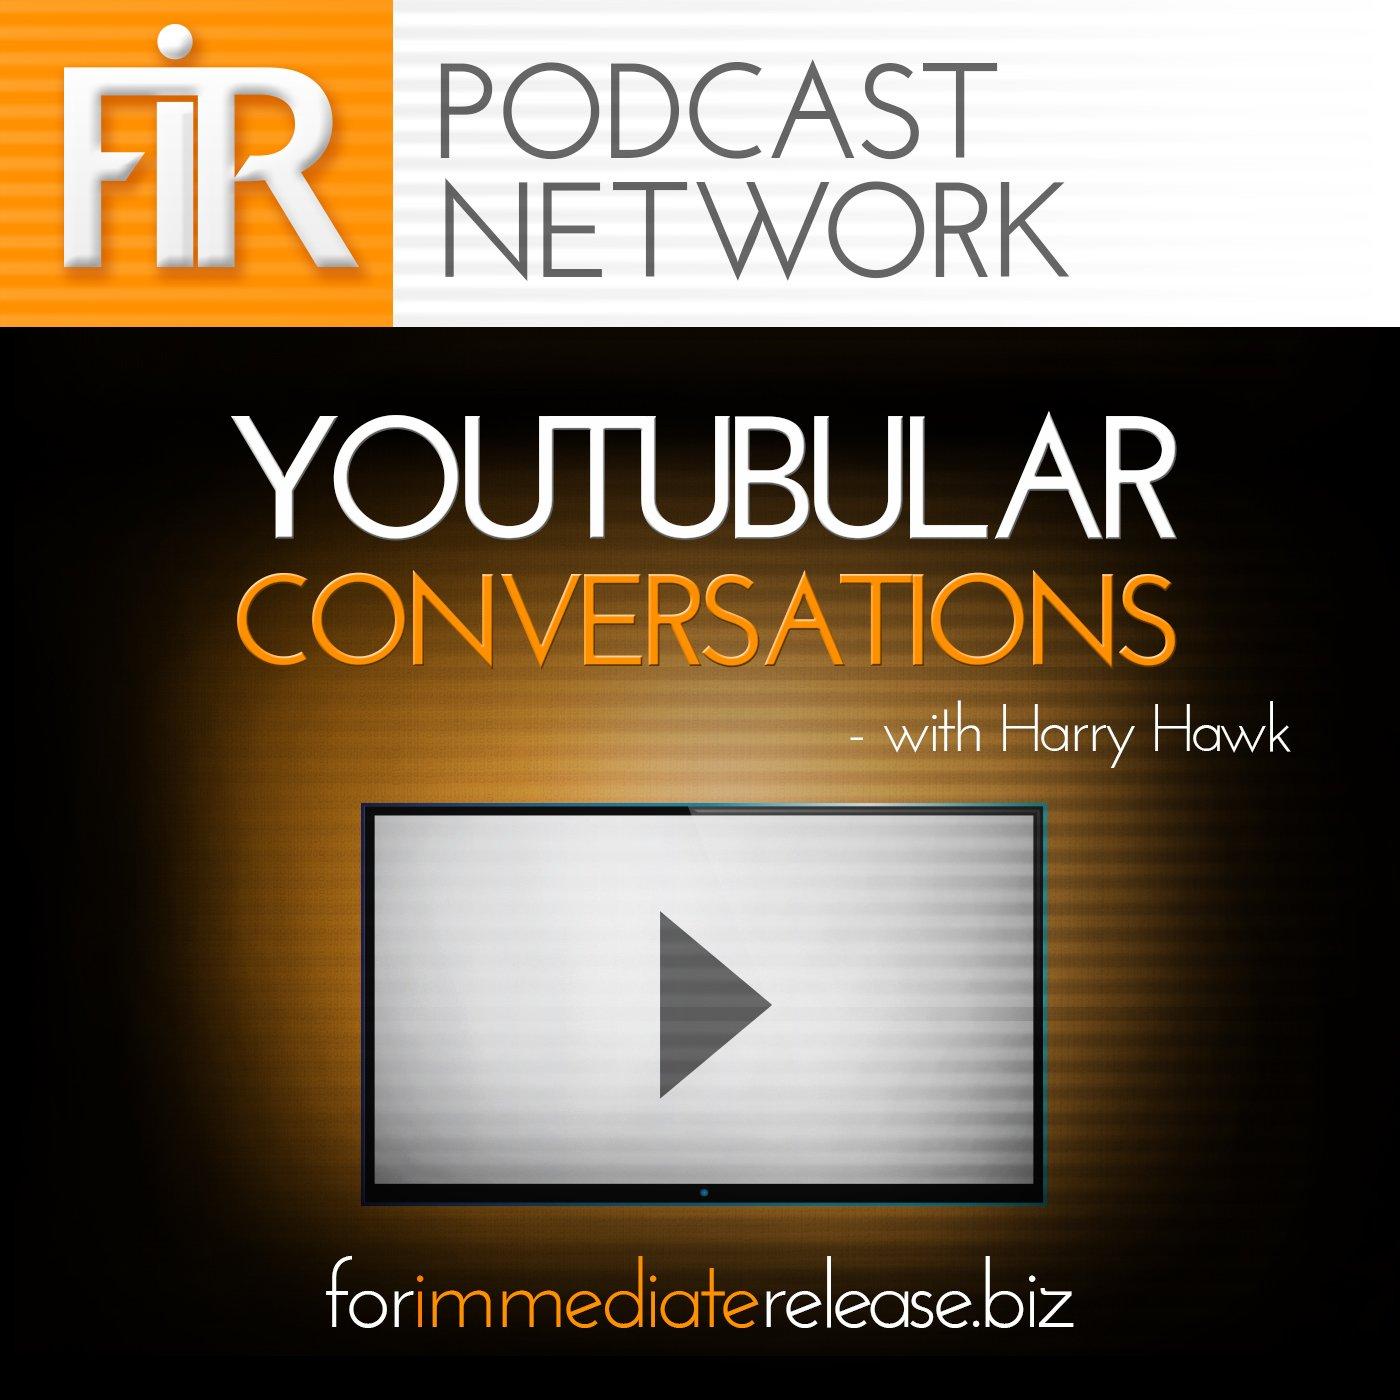 YouTubular Conversations